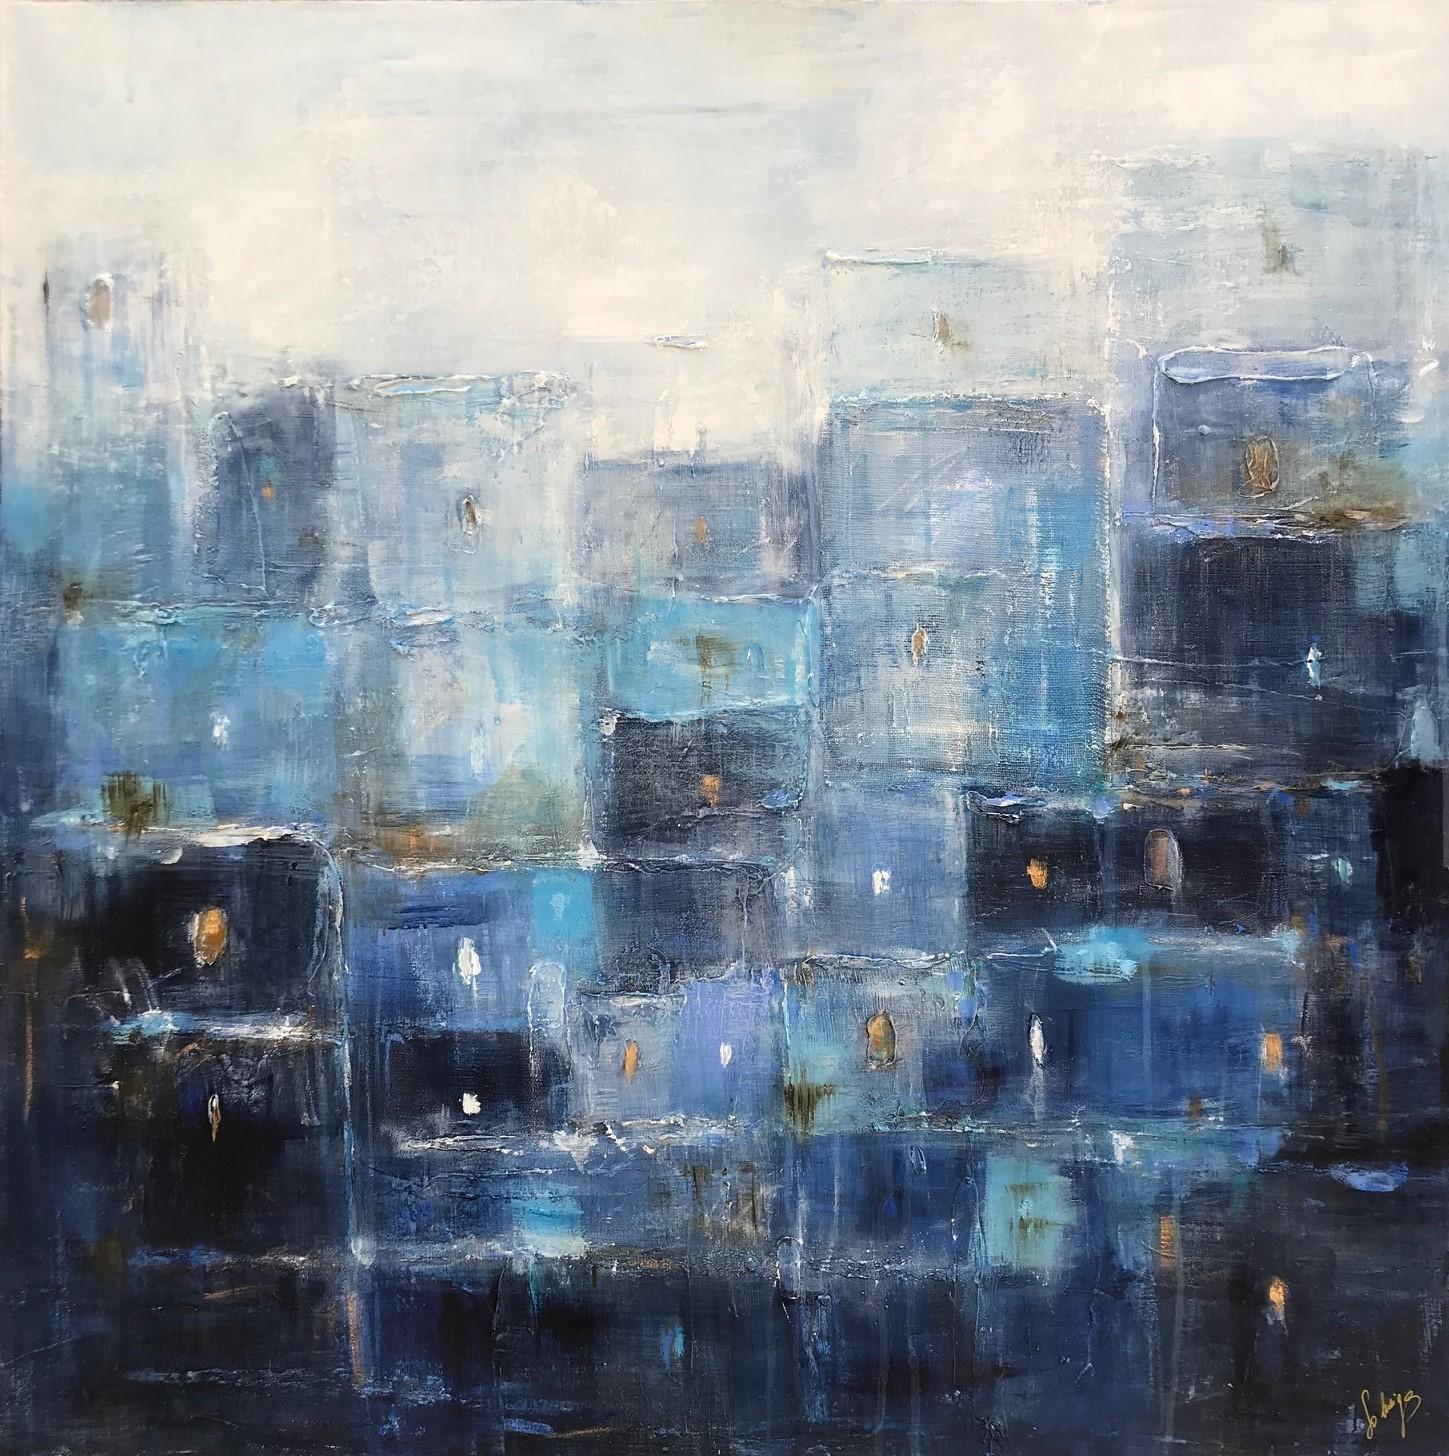 Blue Memories (painting galerie art robert deniau mougins)